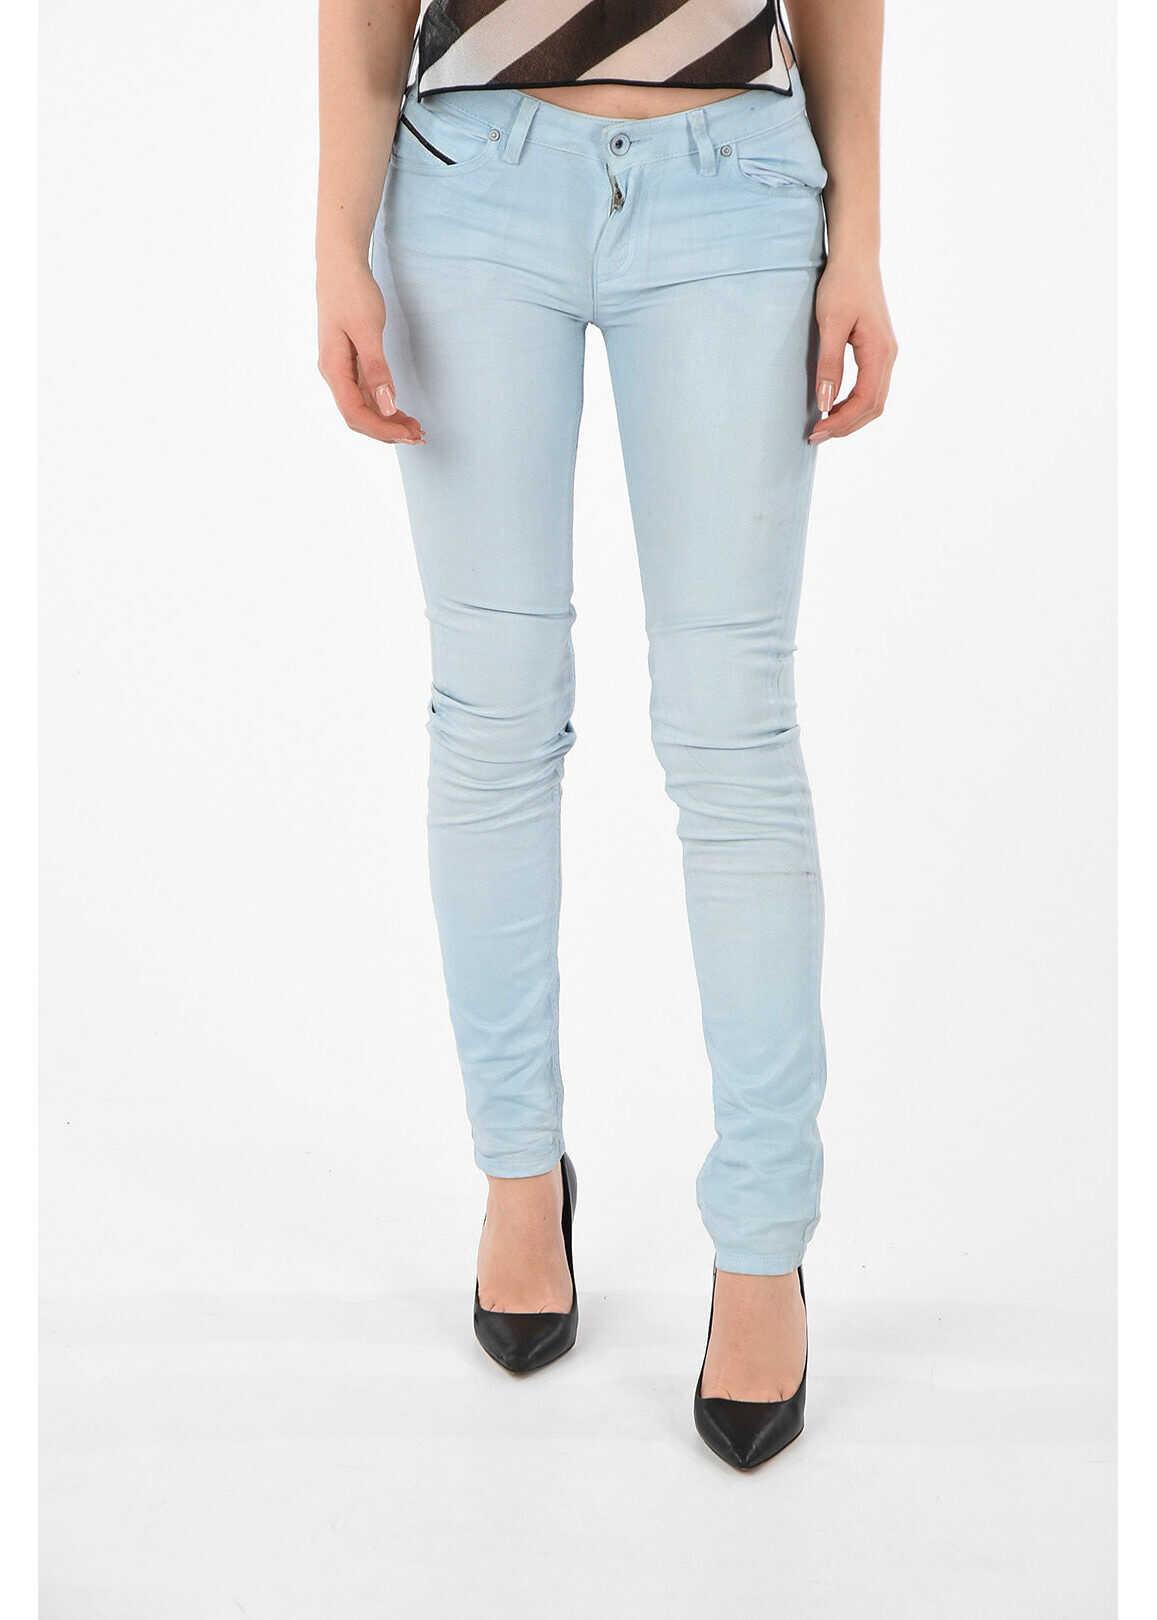 Diesel BLACK GOLD waxed cotton jeans BLUE